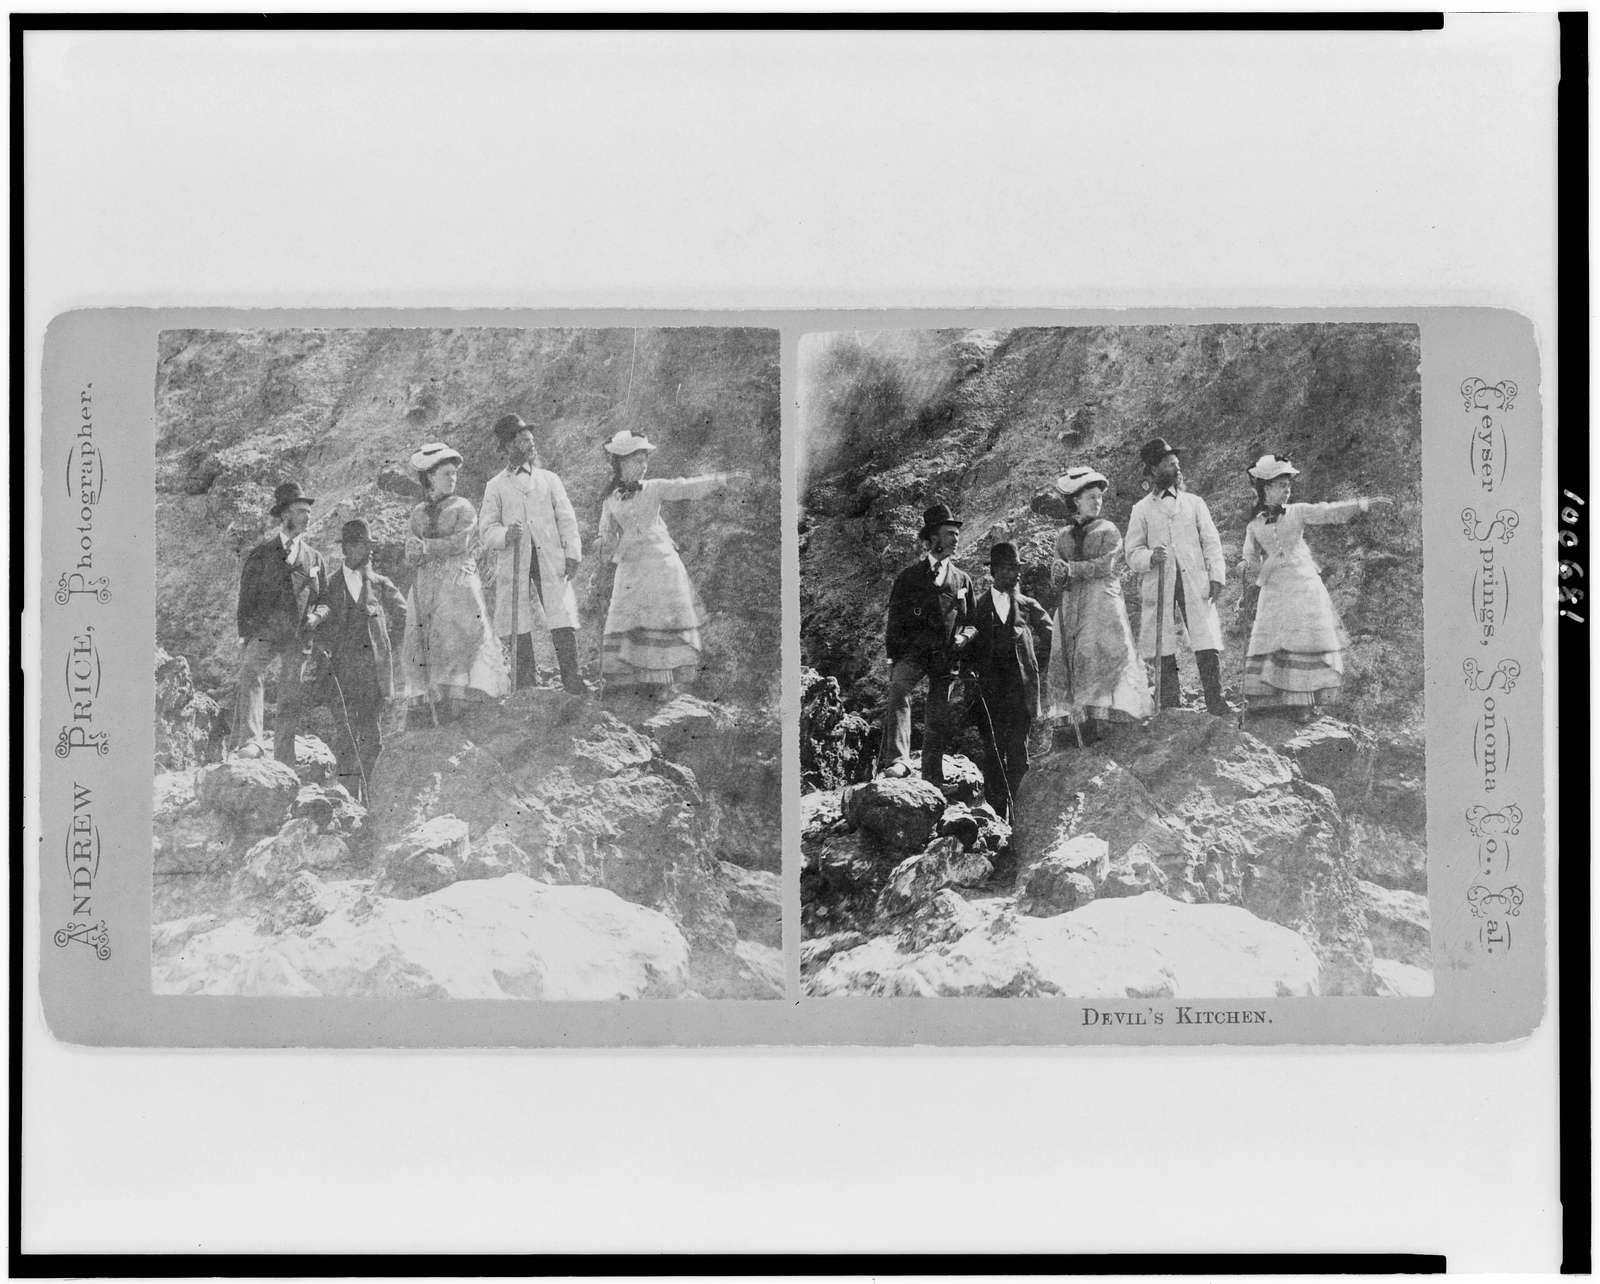 Devil's Kitchen, Geyser Springs, Sonoma Co., Cal. / Andrew Price, photographer.